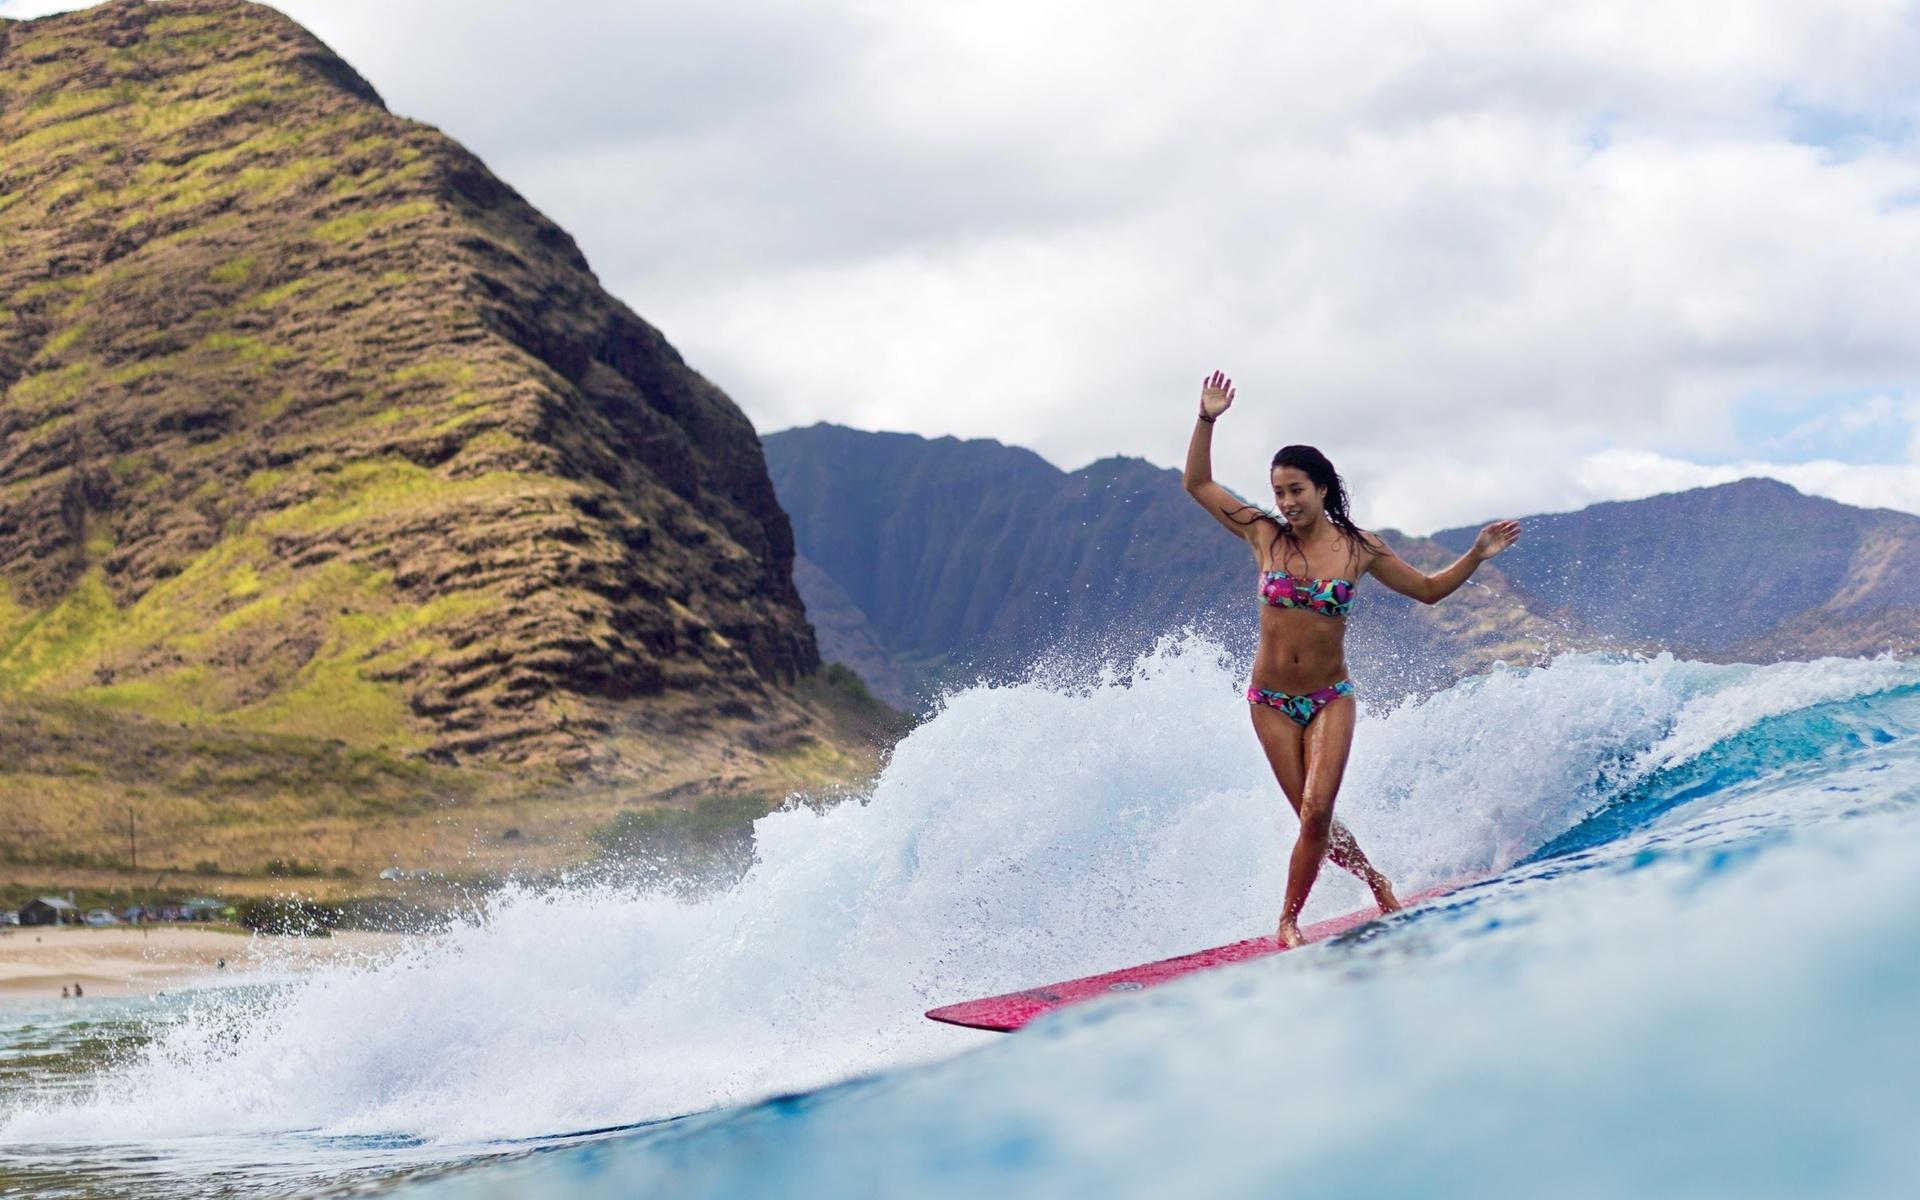 Chicas practicando Surf - 1920x1200